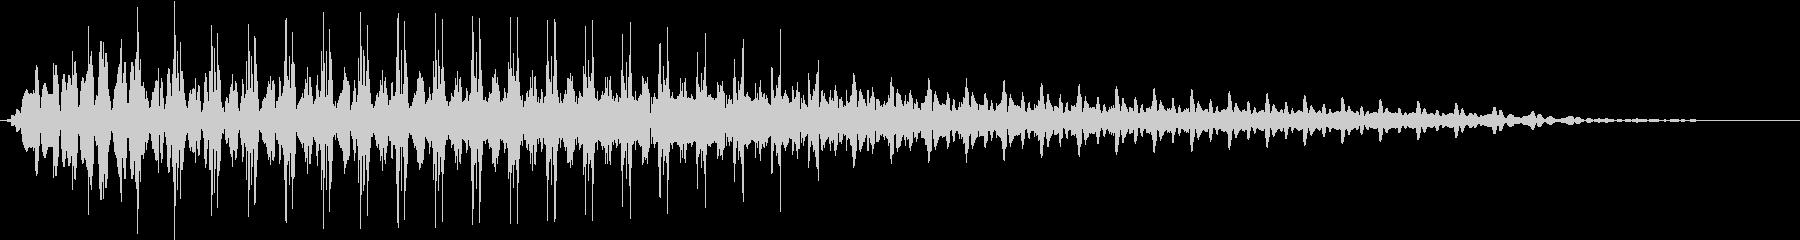 Beam ライトセーバー風 ブォーン音の未再生の波形